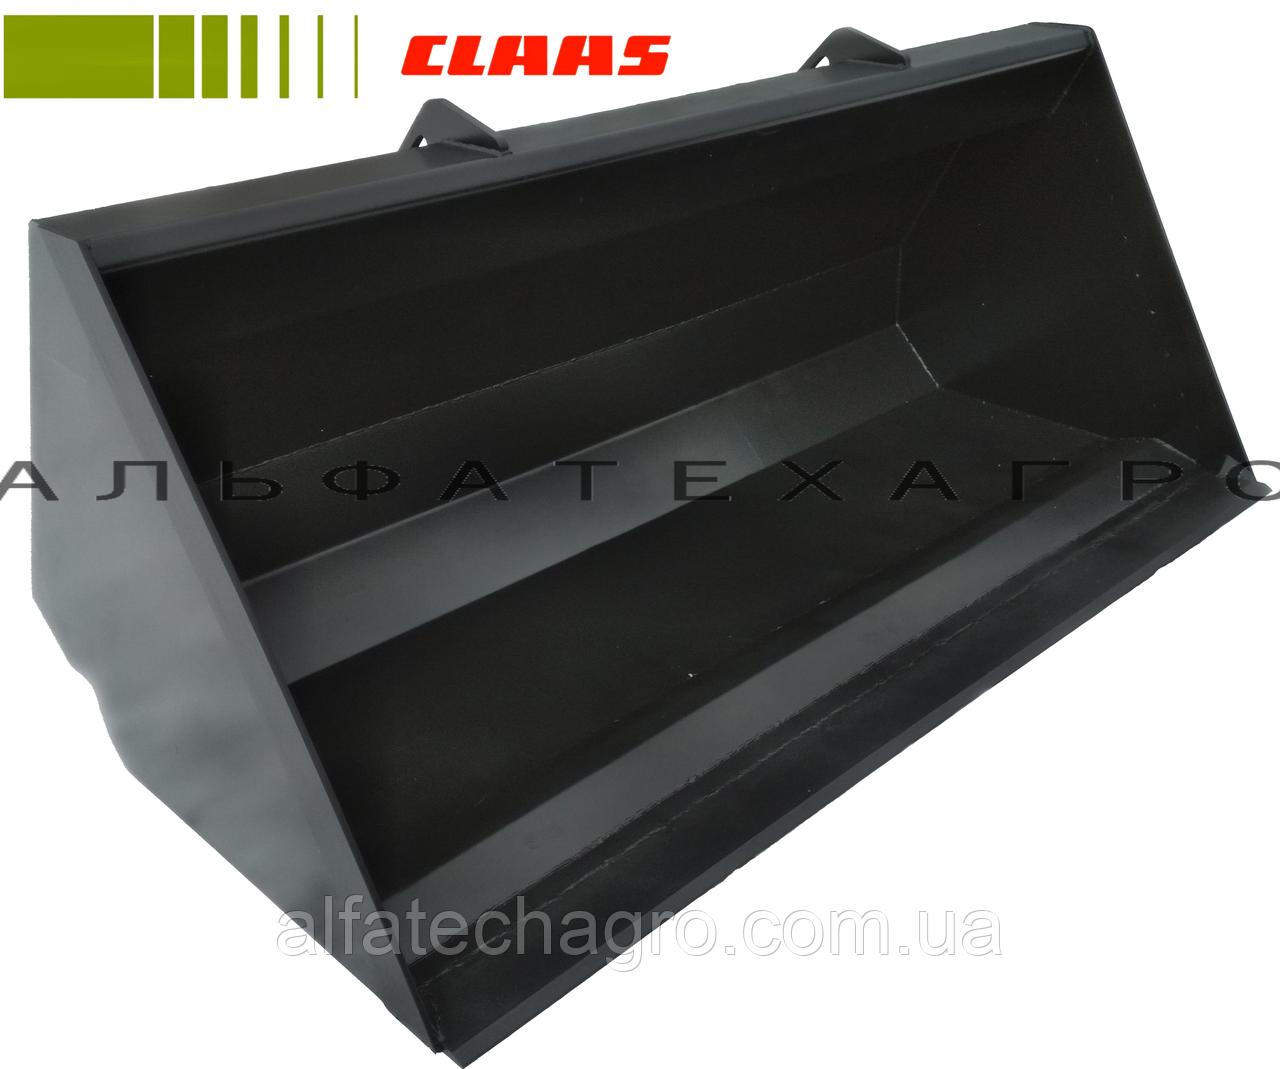 Ковш на навантажувач Claas